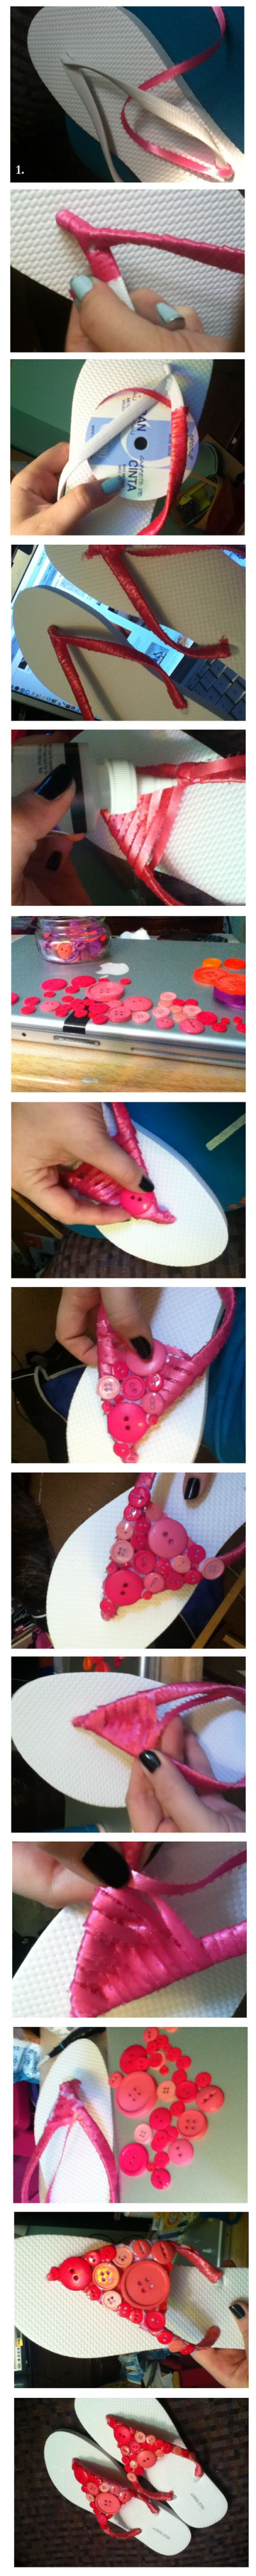 09-Diy-Ruffle-flip-flops-Sandals